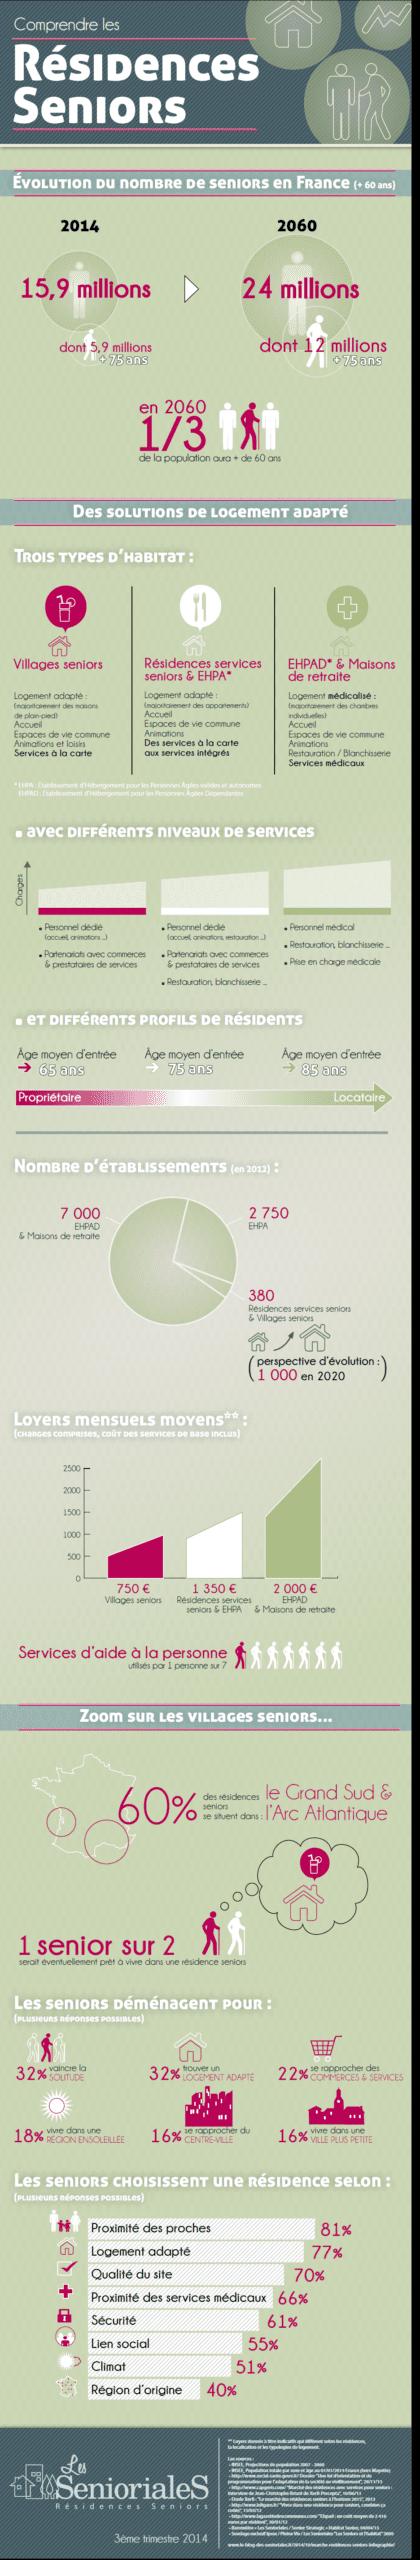 Infographie les residences seniors